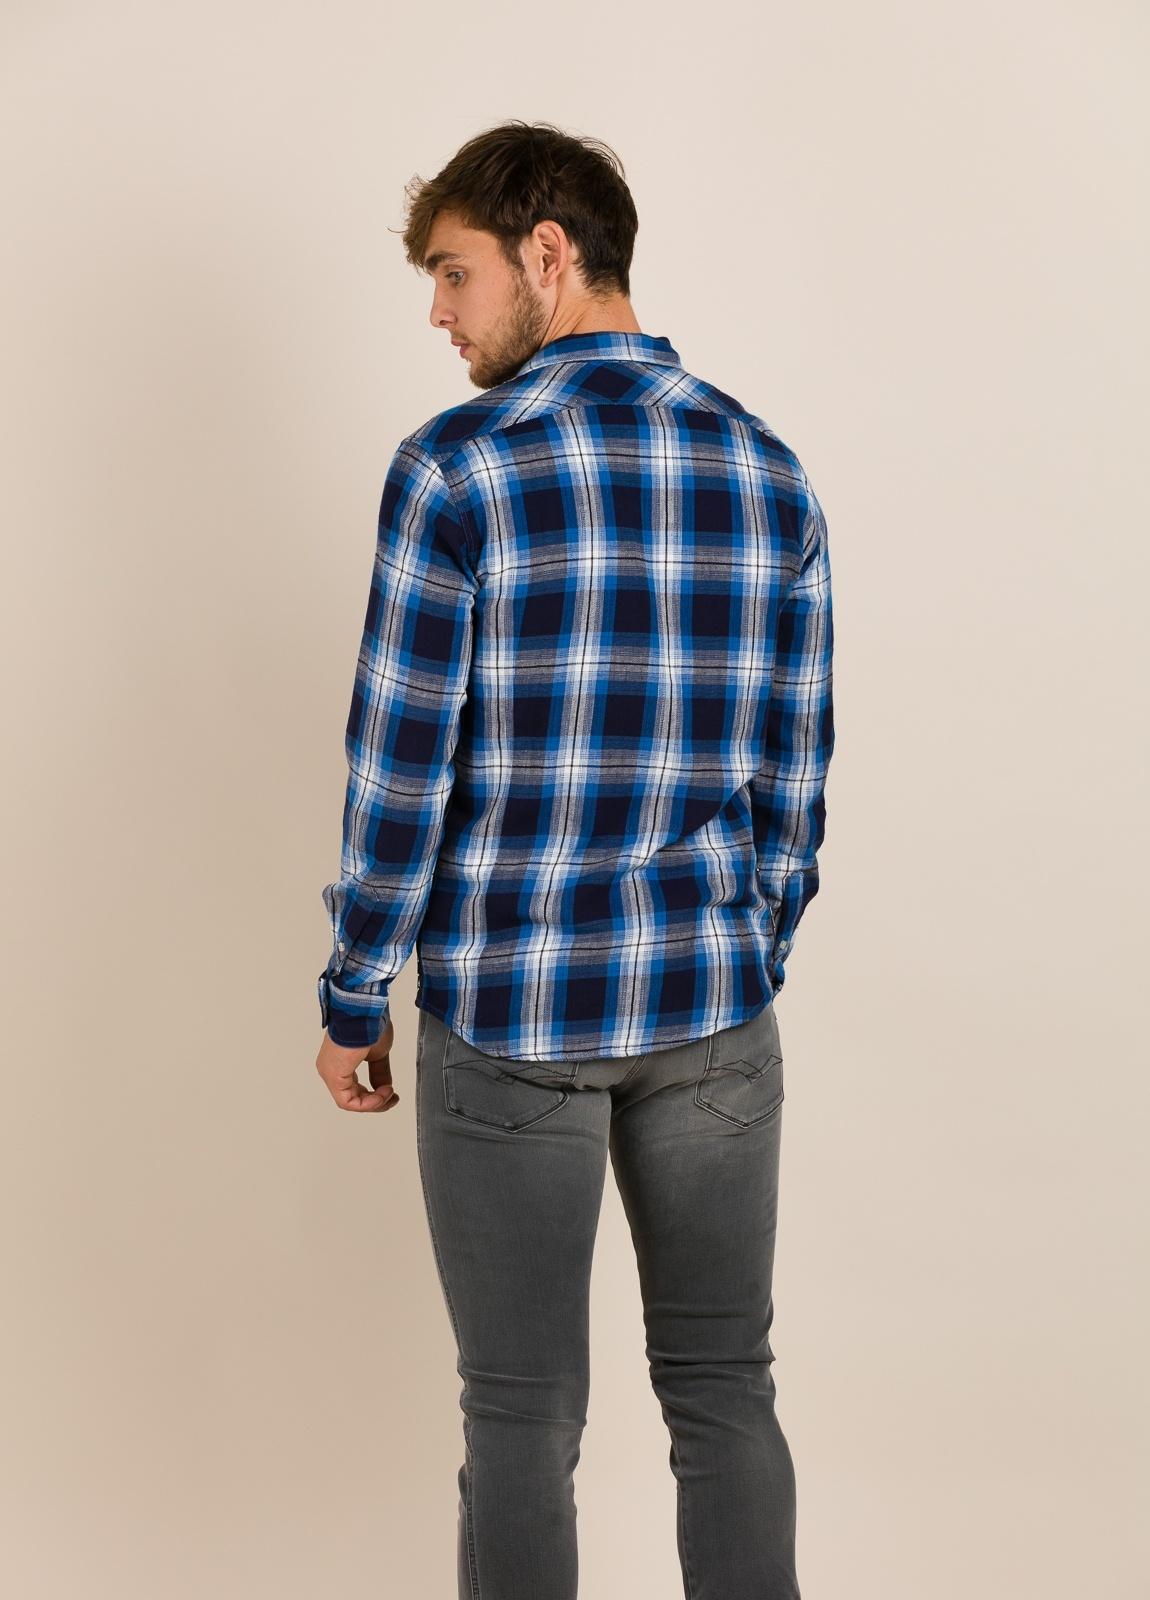 Camisa REPLAY cuadros azules - Ítem2